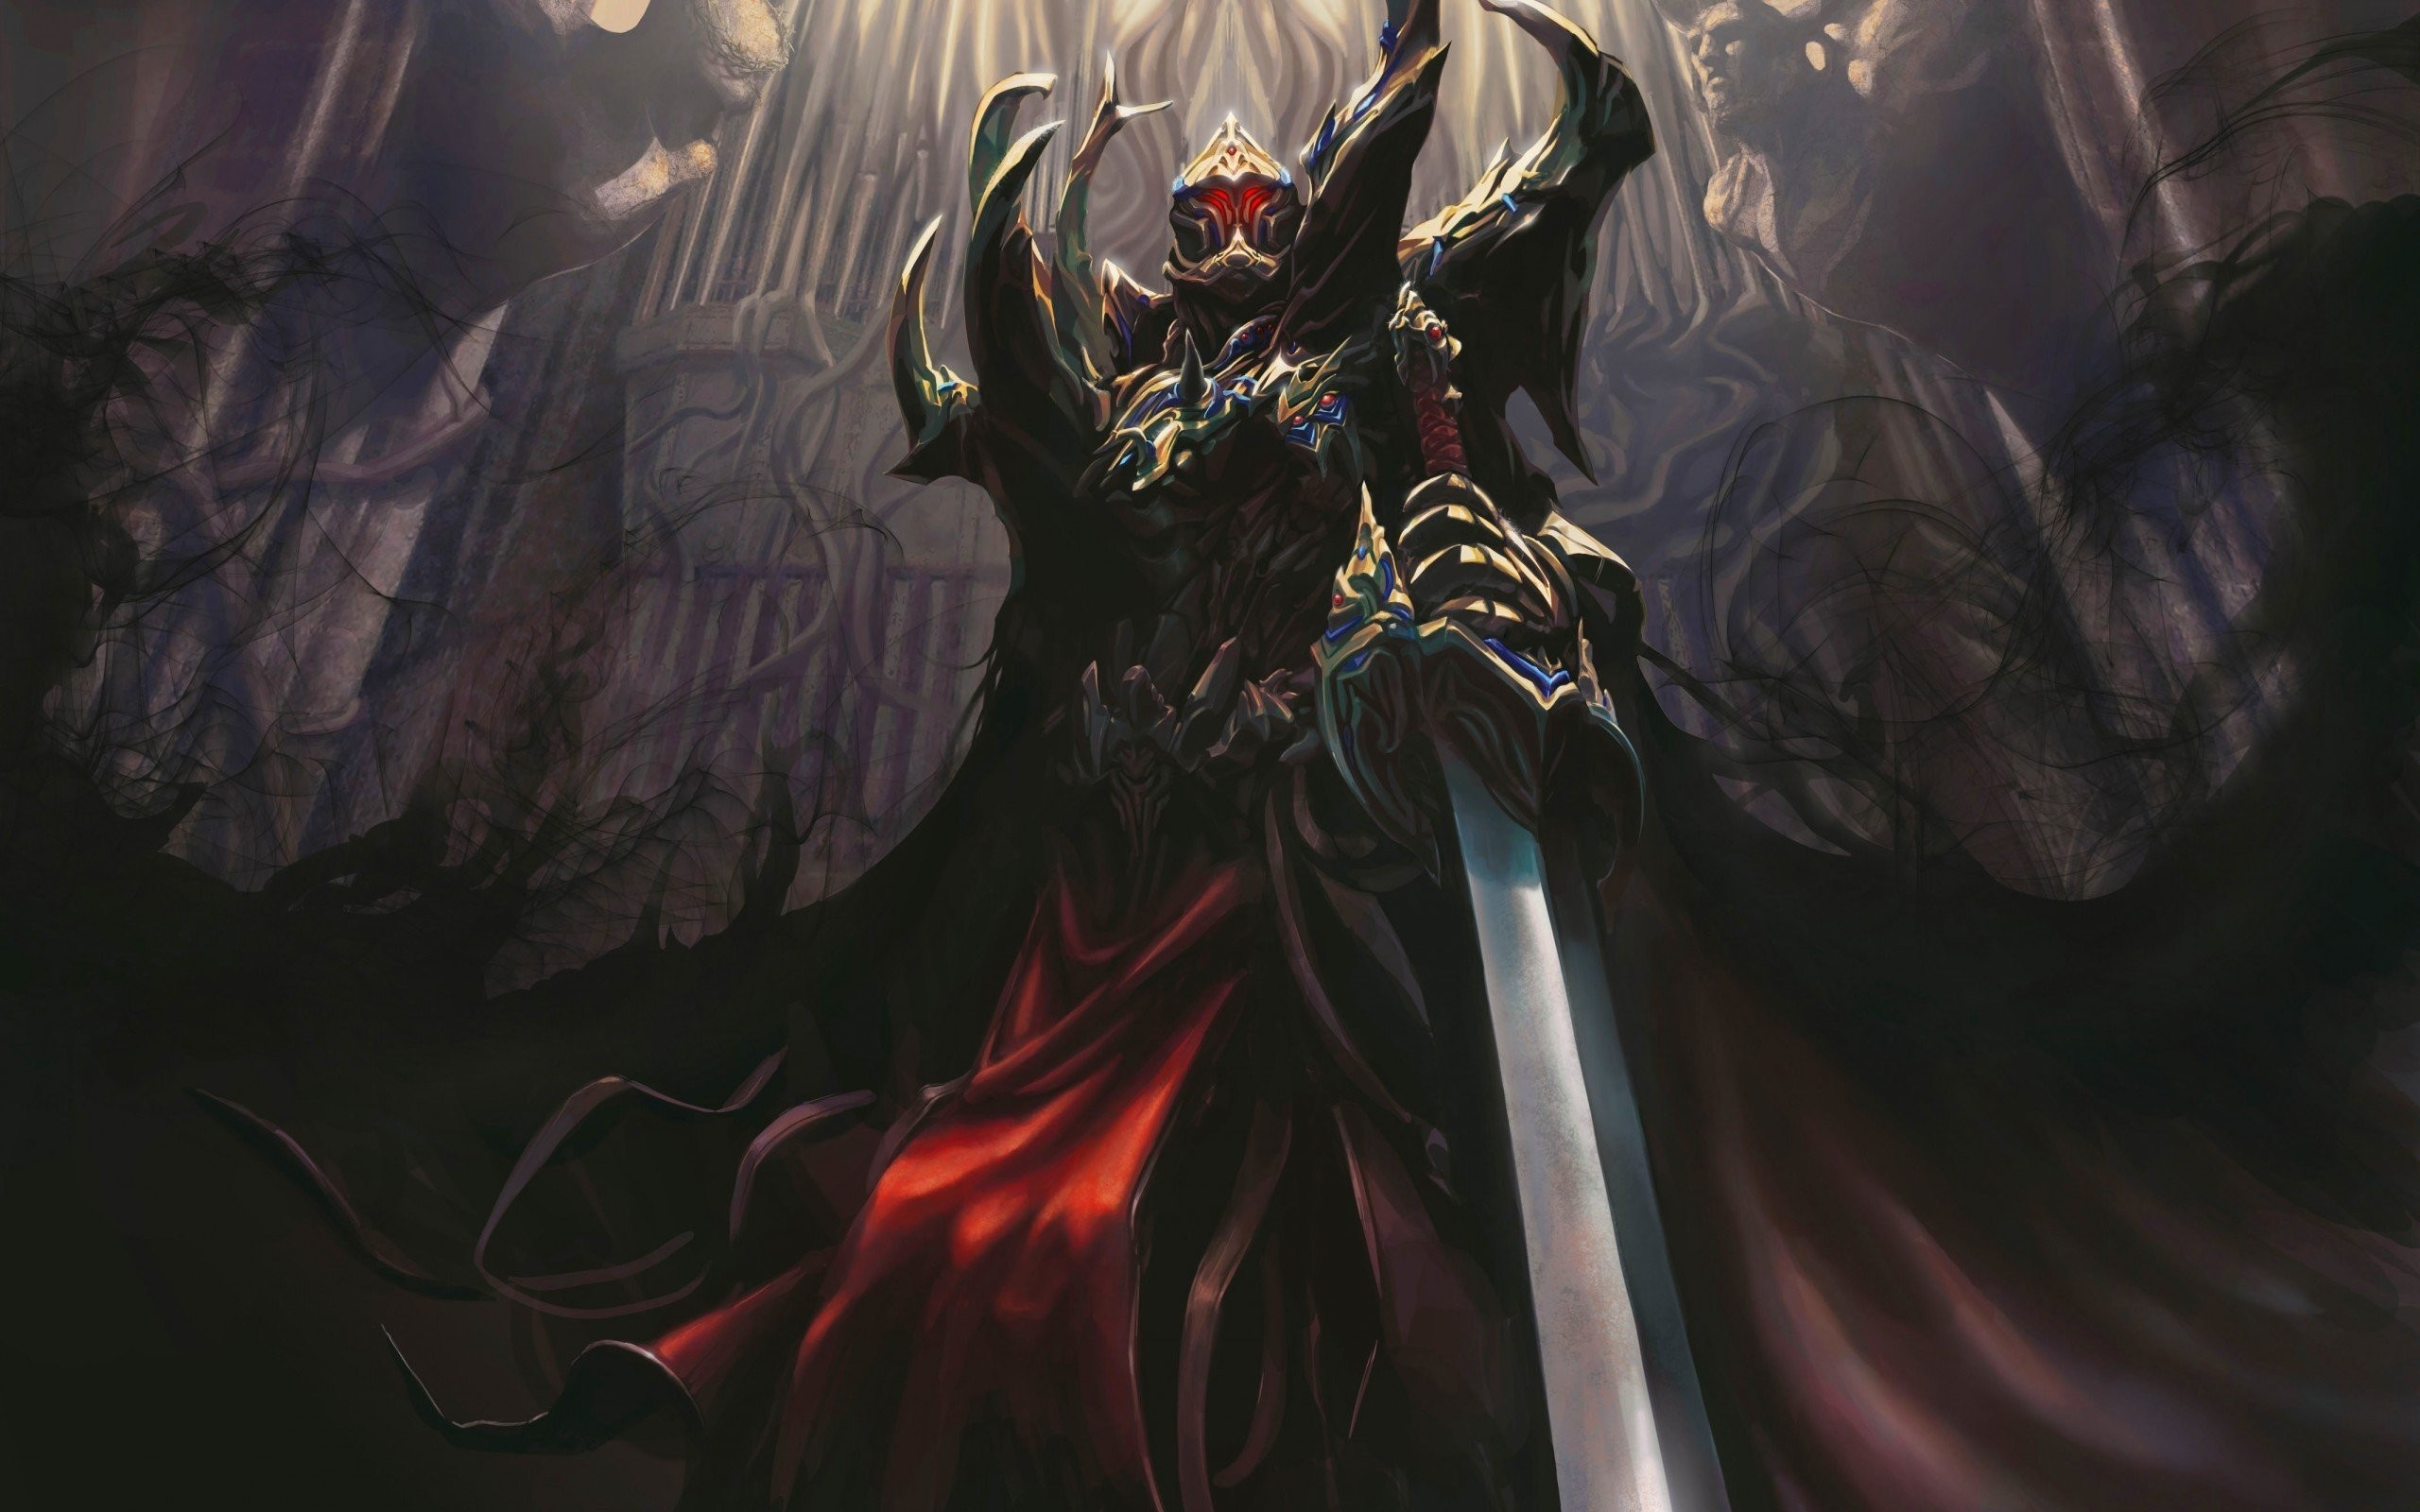 Armor Artwork Dark Death Fantasy Art Knights Shadows Swords